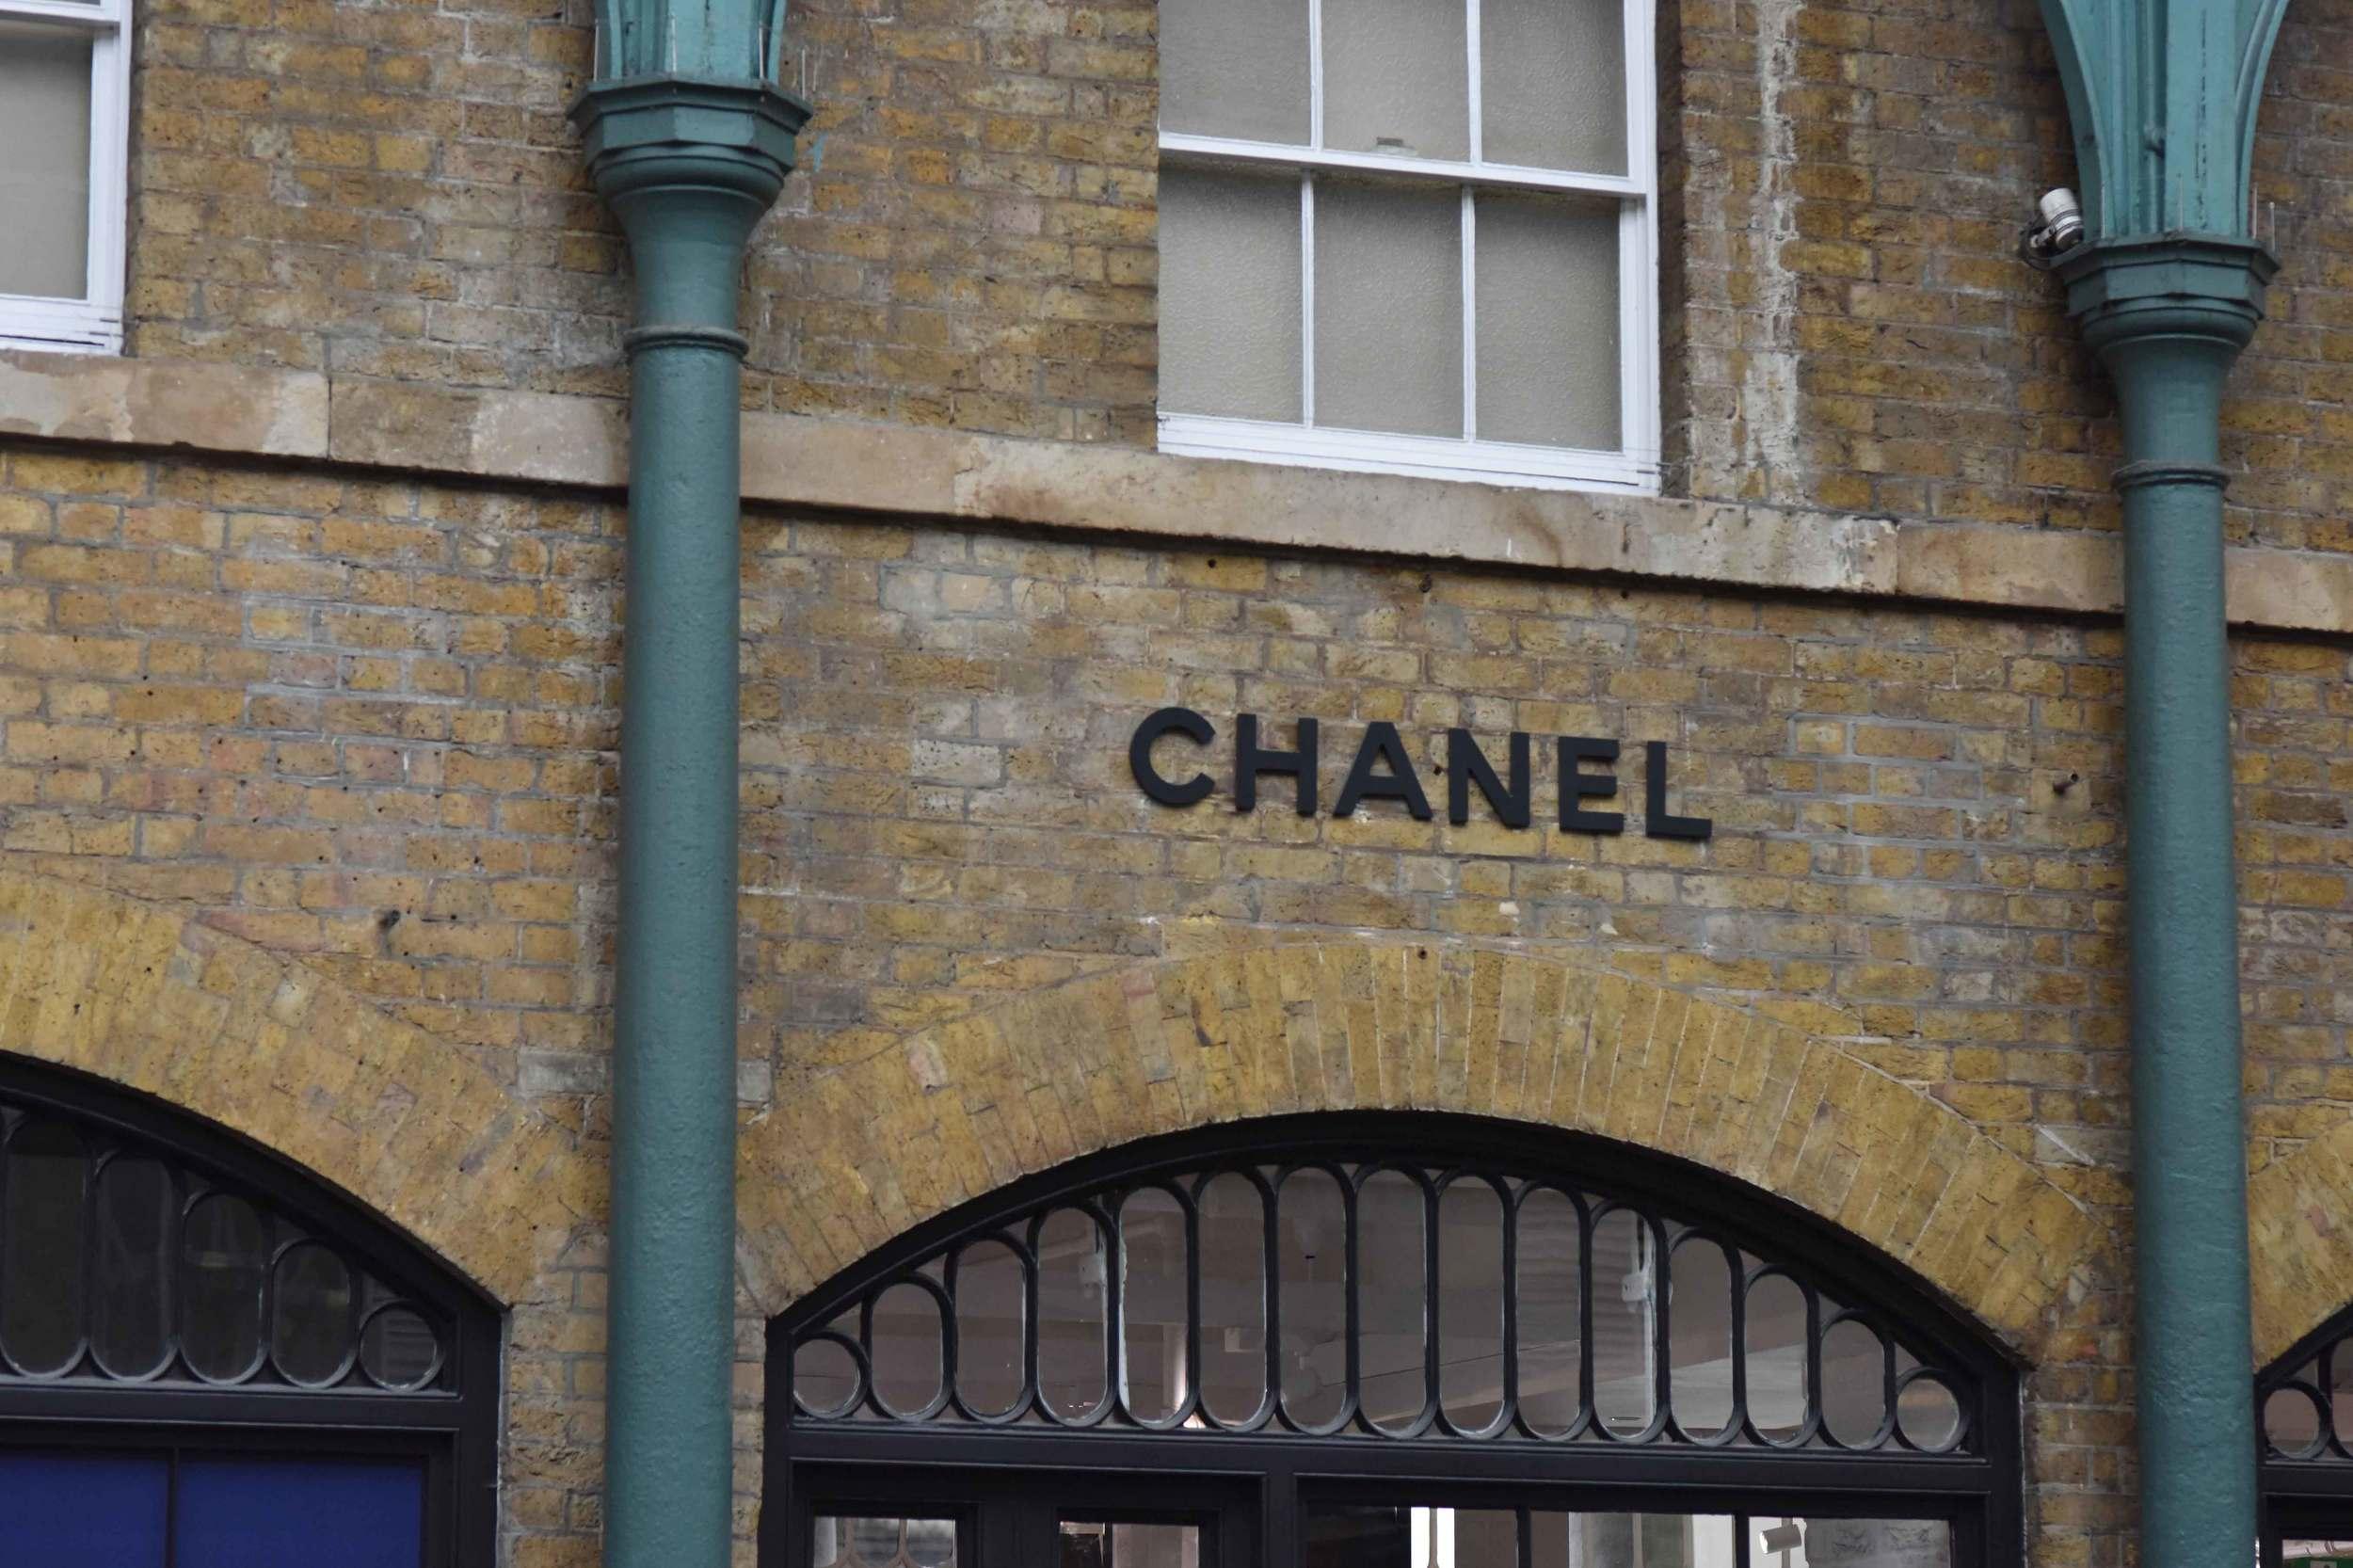 Chanel store, Apple Market, Covent Garden, London, UK. Image©sourcingstyle.com